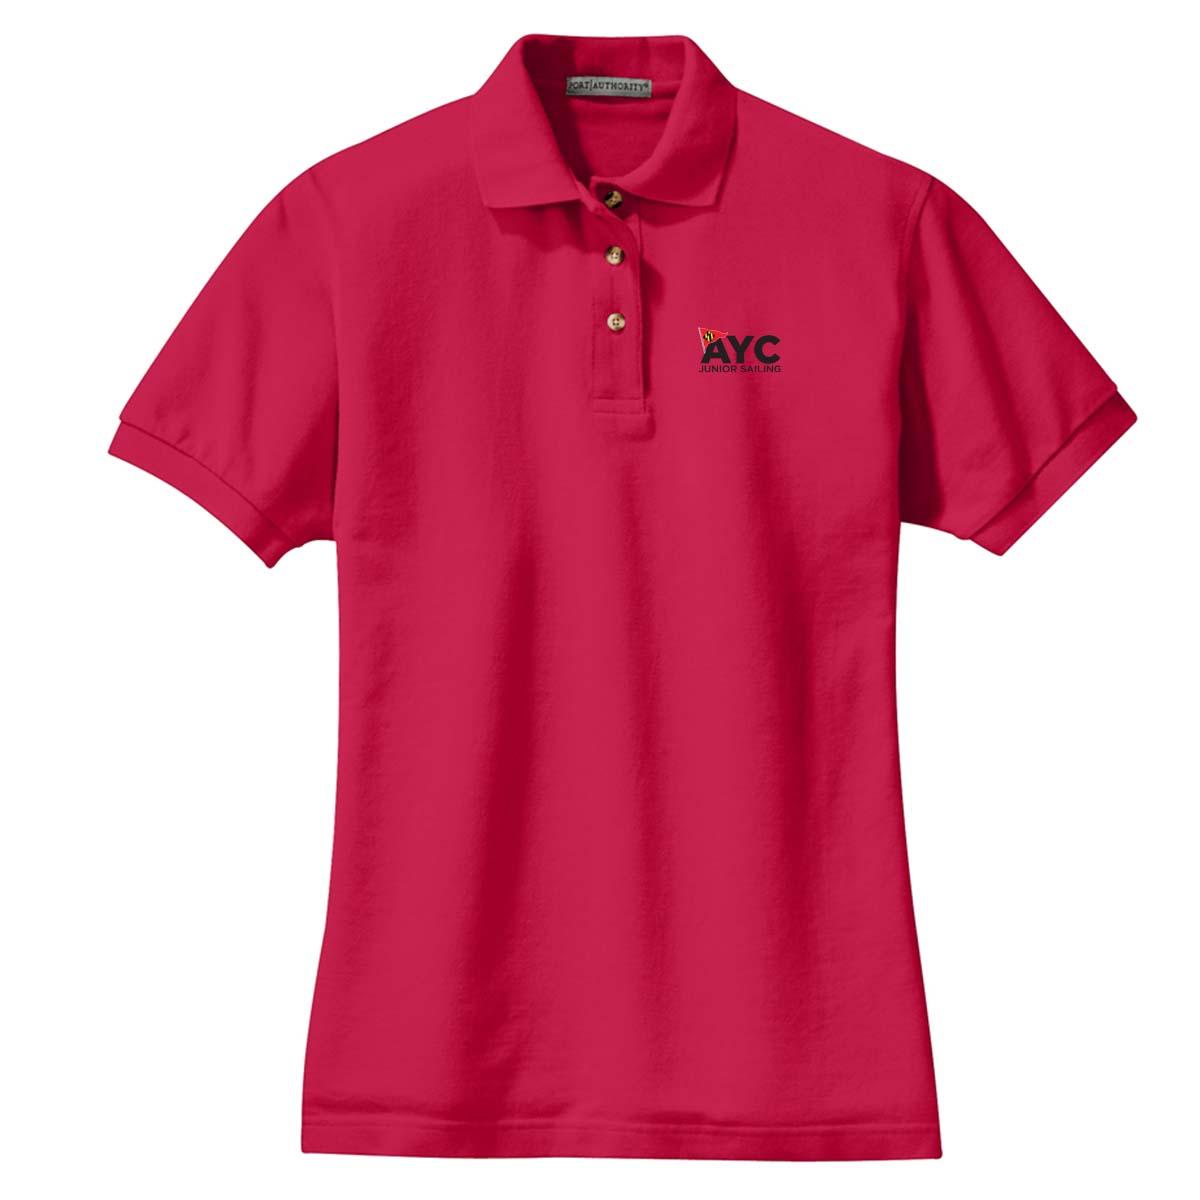 AJYC - Women's COTTON POLO